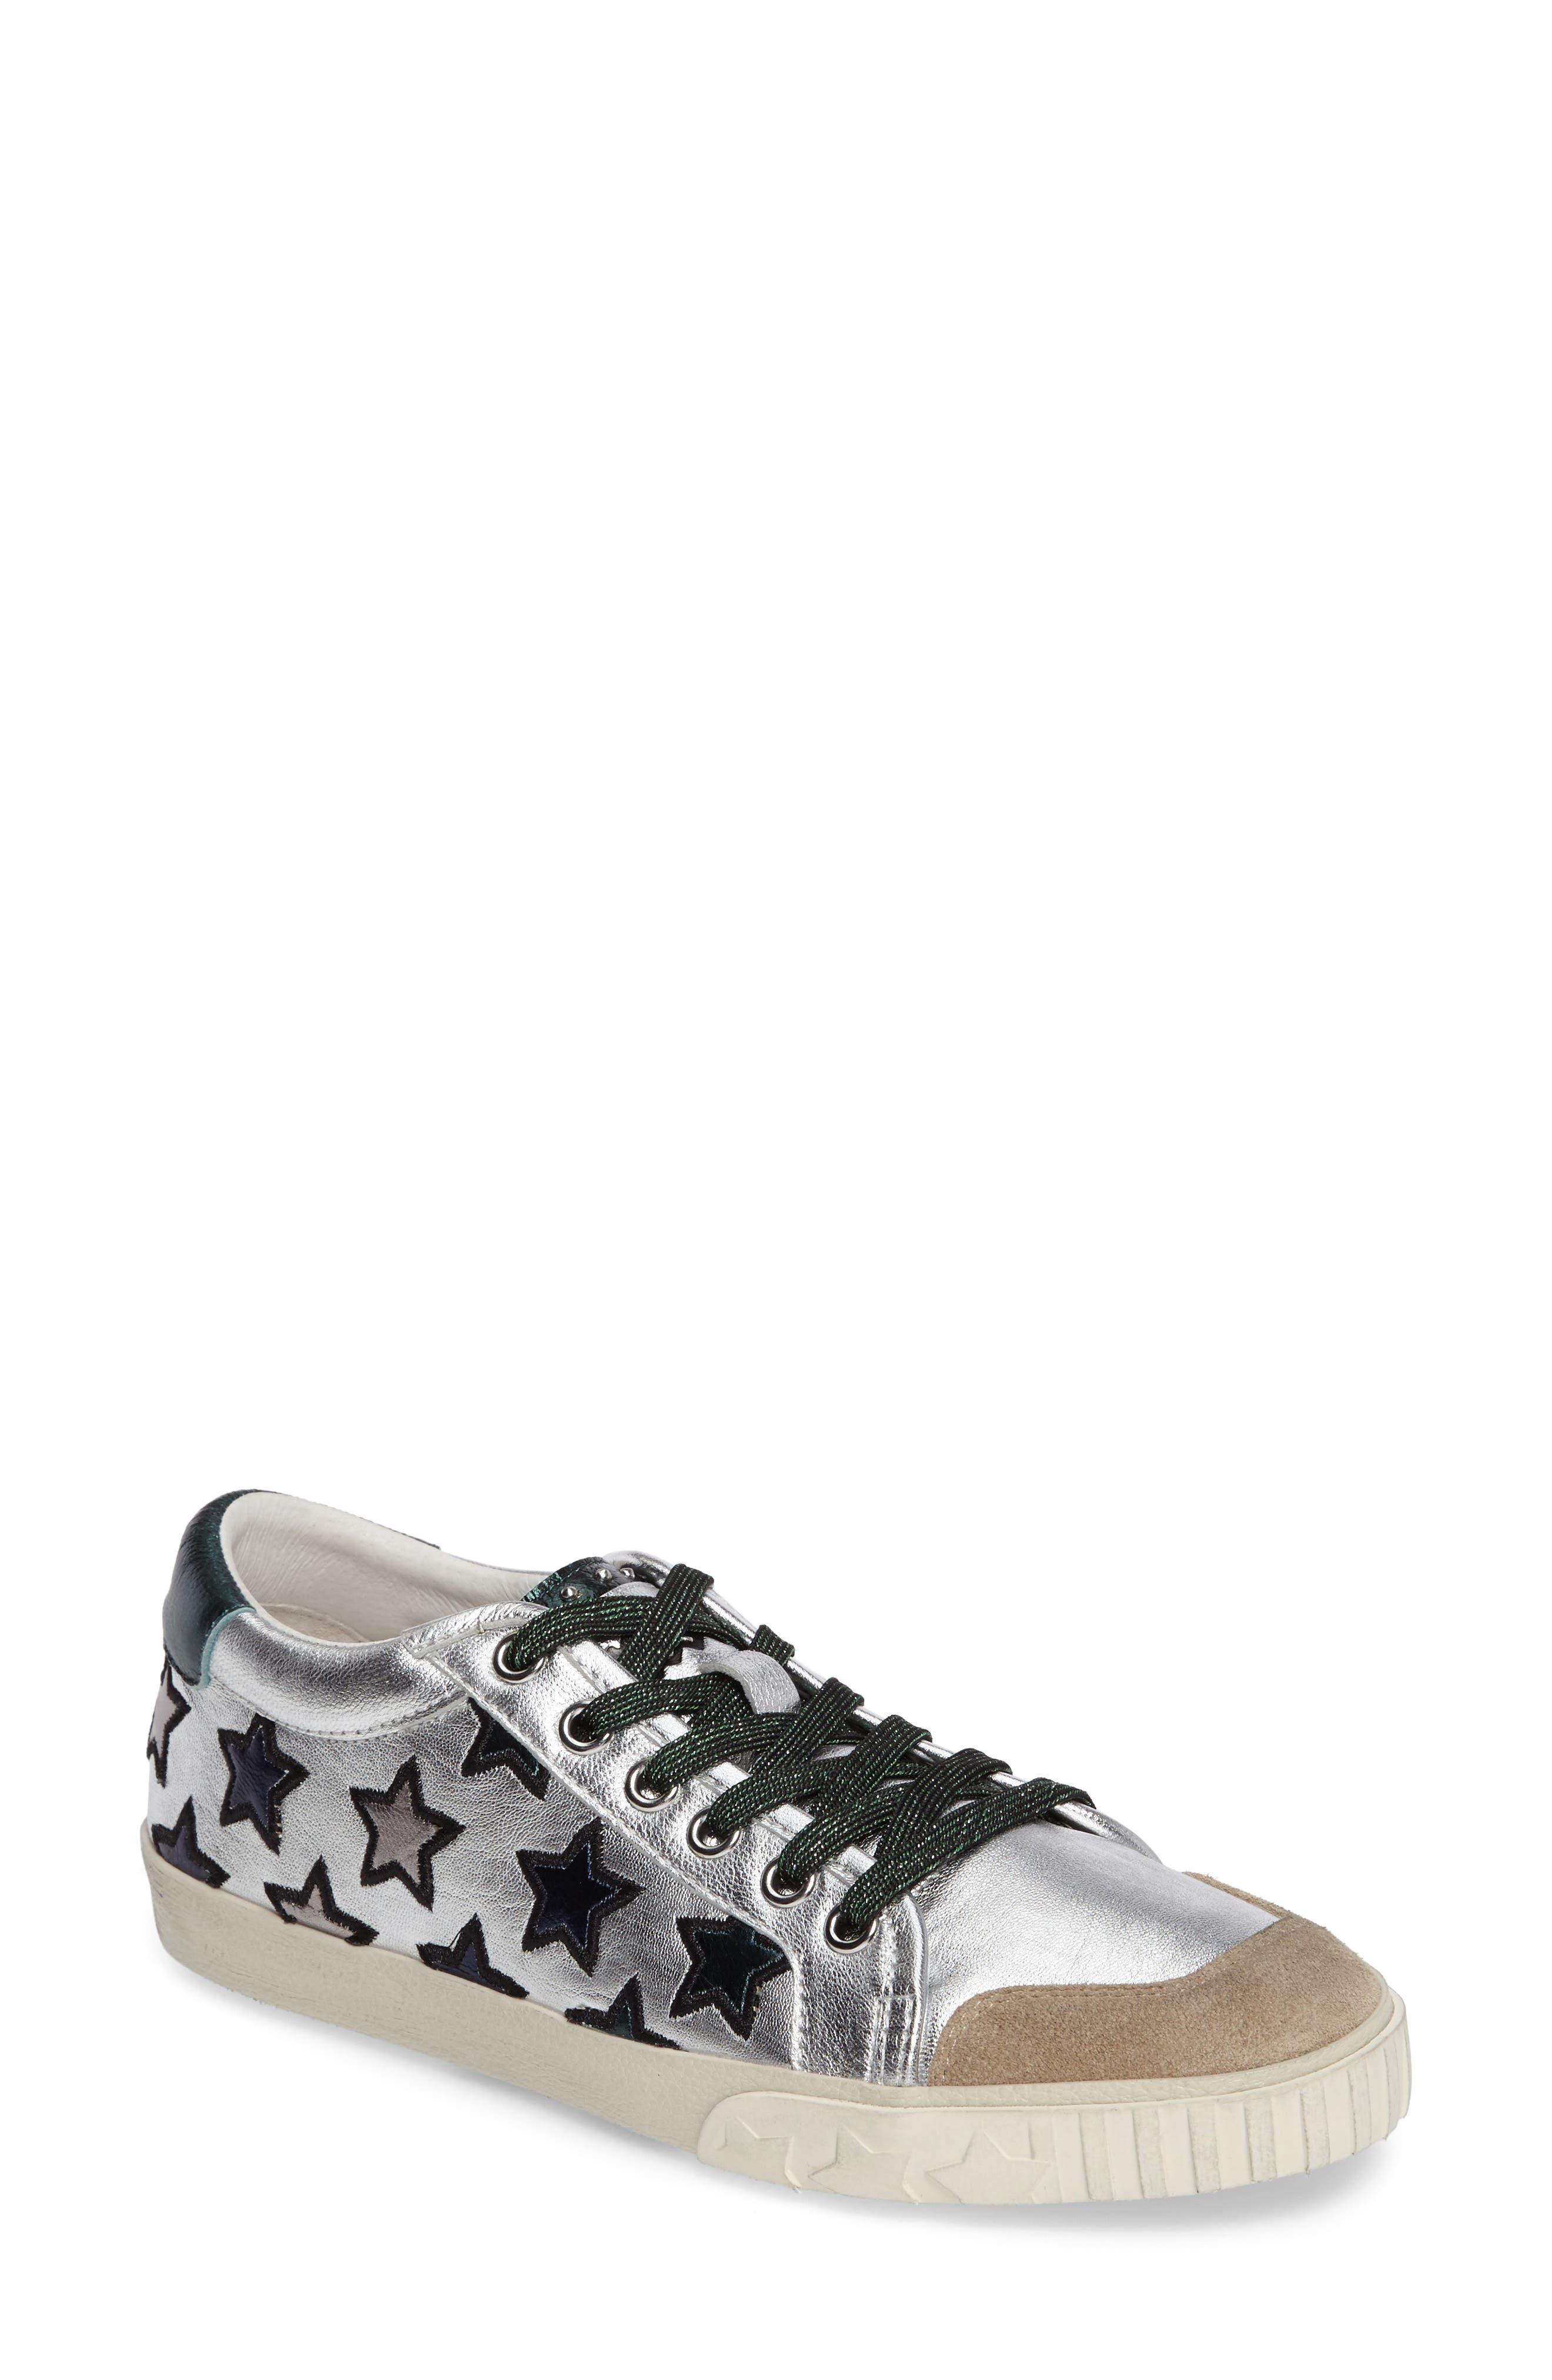 ASH Majestic Sneaker